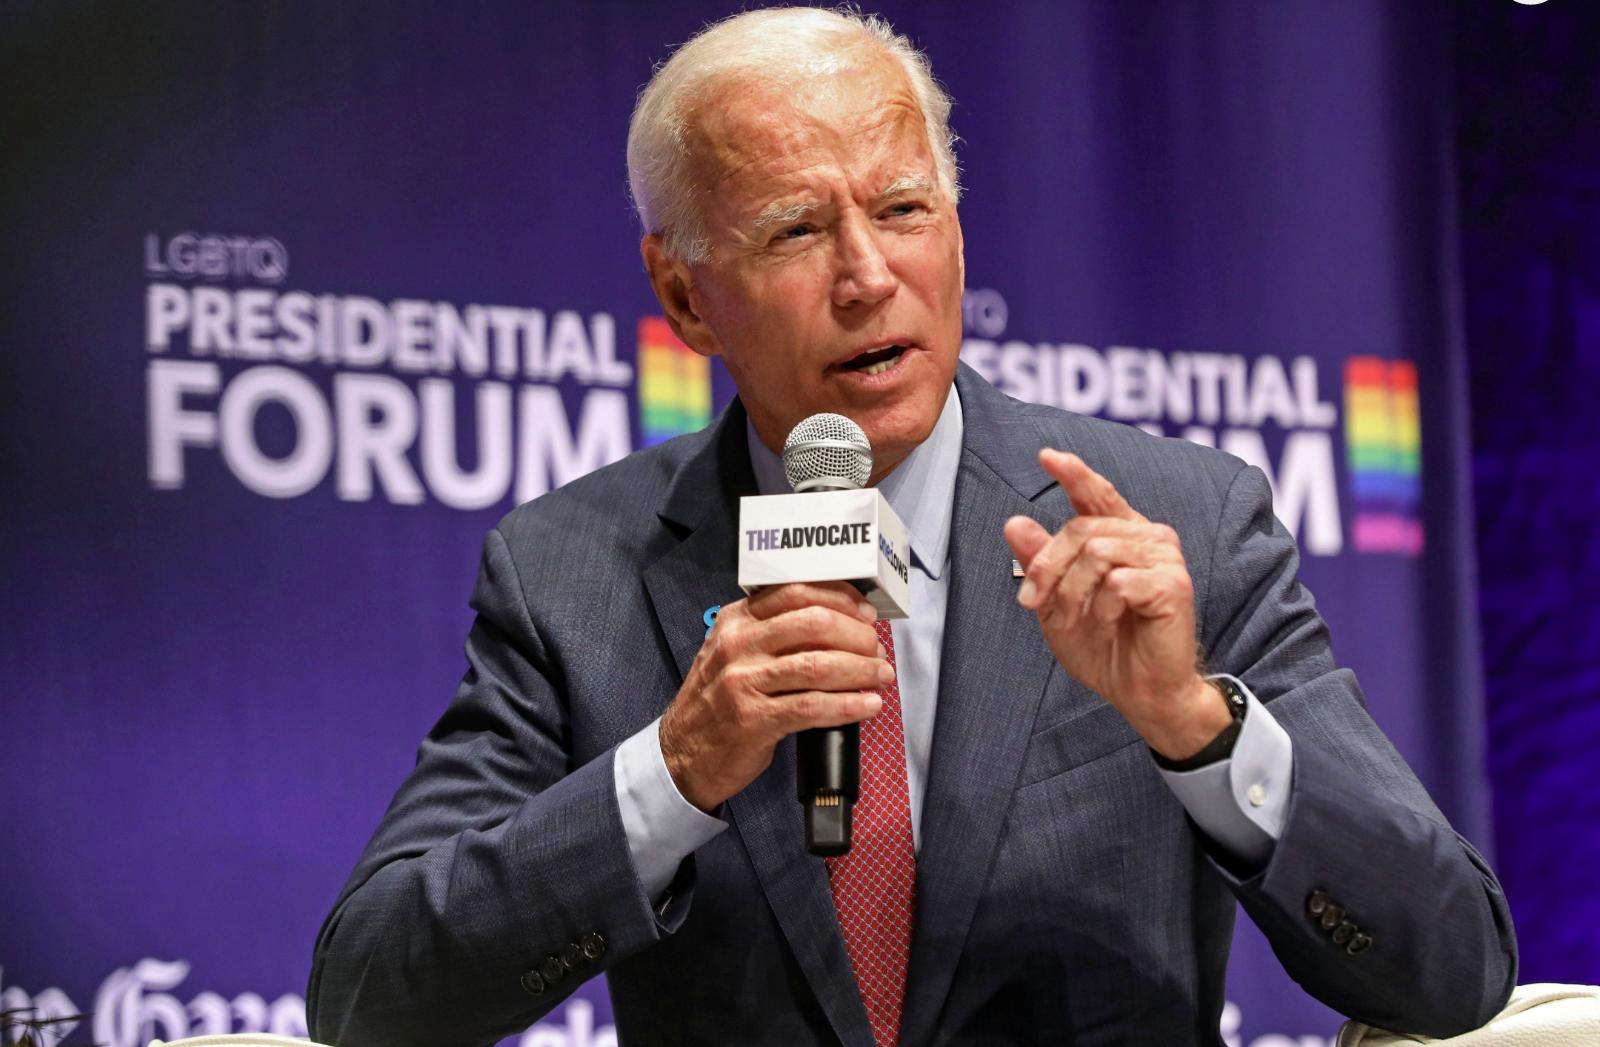 Public Schools Will Be Forced To Allow Biological Males On Female Sports Teams If Joe Biden Wins